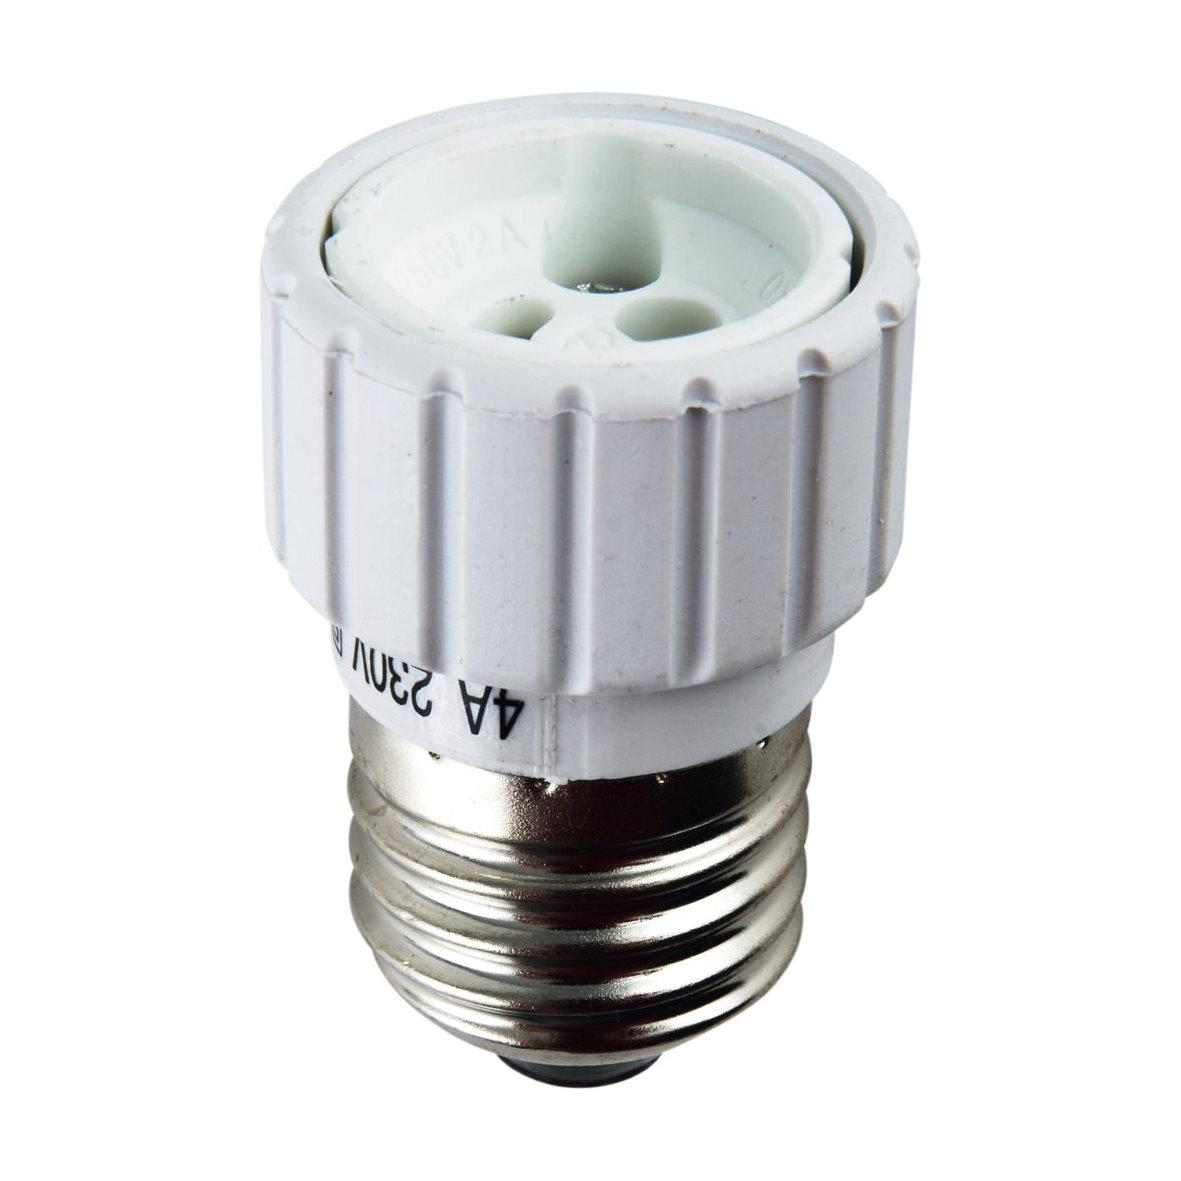 mount holder adapter converter socket e27 e14 to gu10 g9 gu9 gx5 3 gx53 ebay. Black Bedroom Furniture Sets. Home Design Ideas